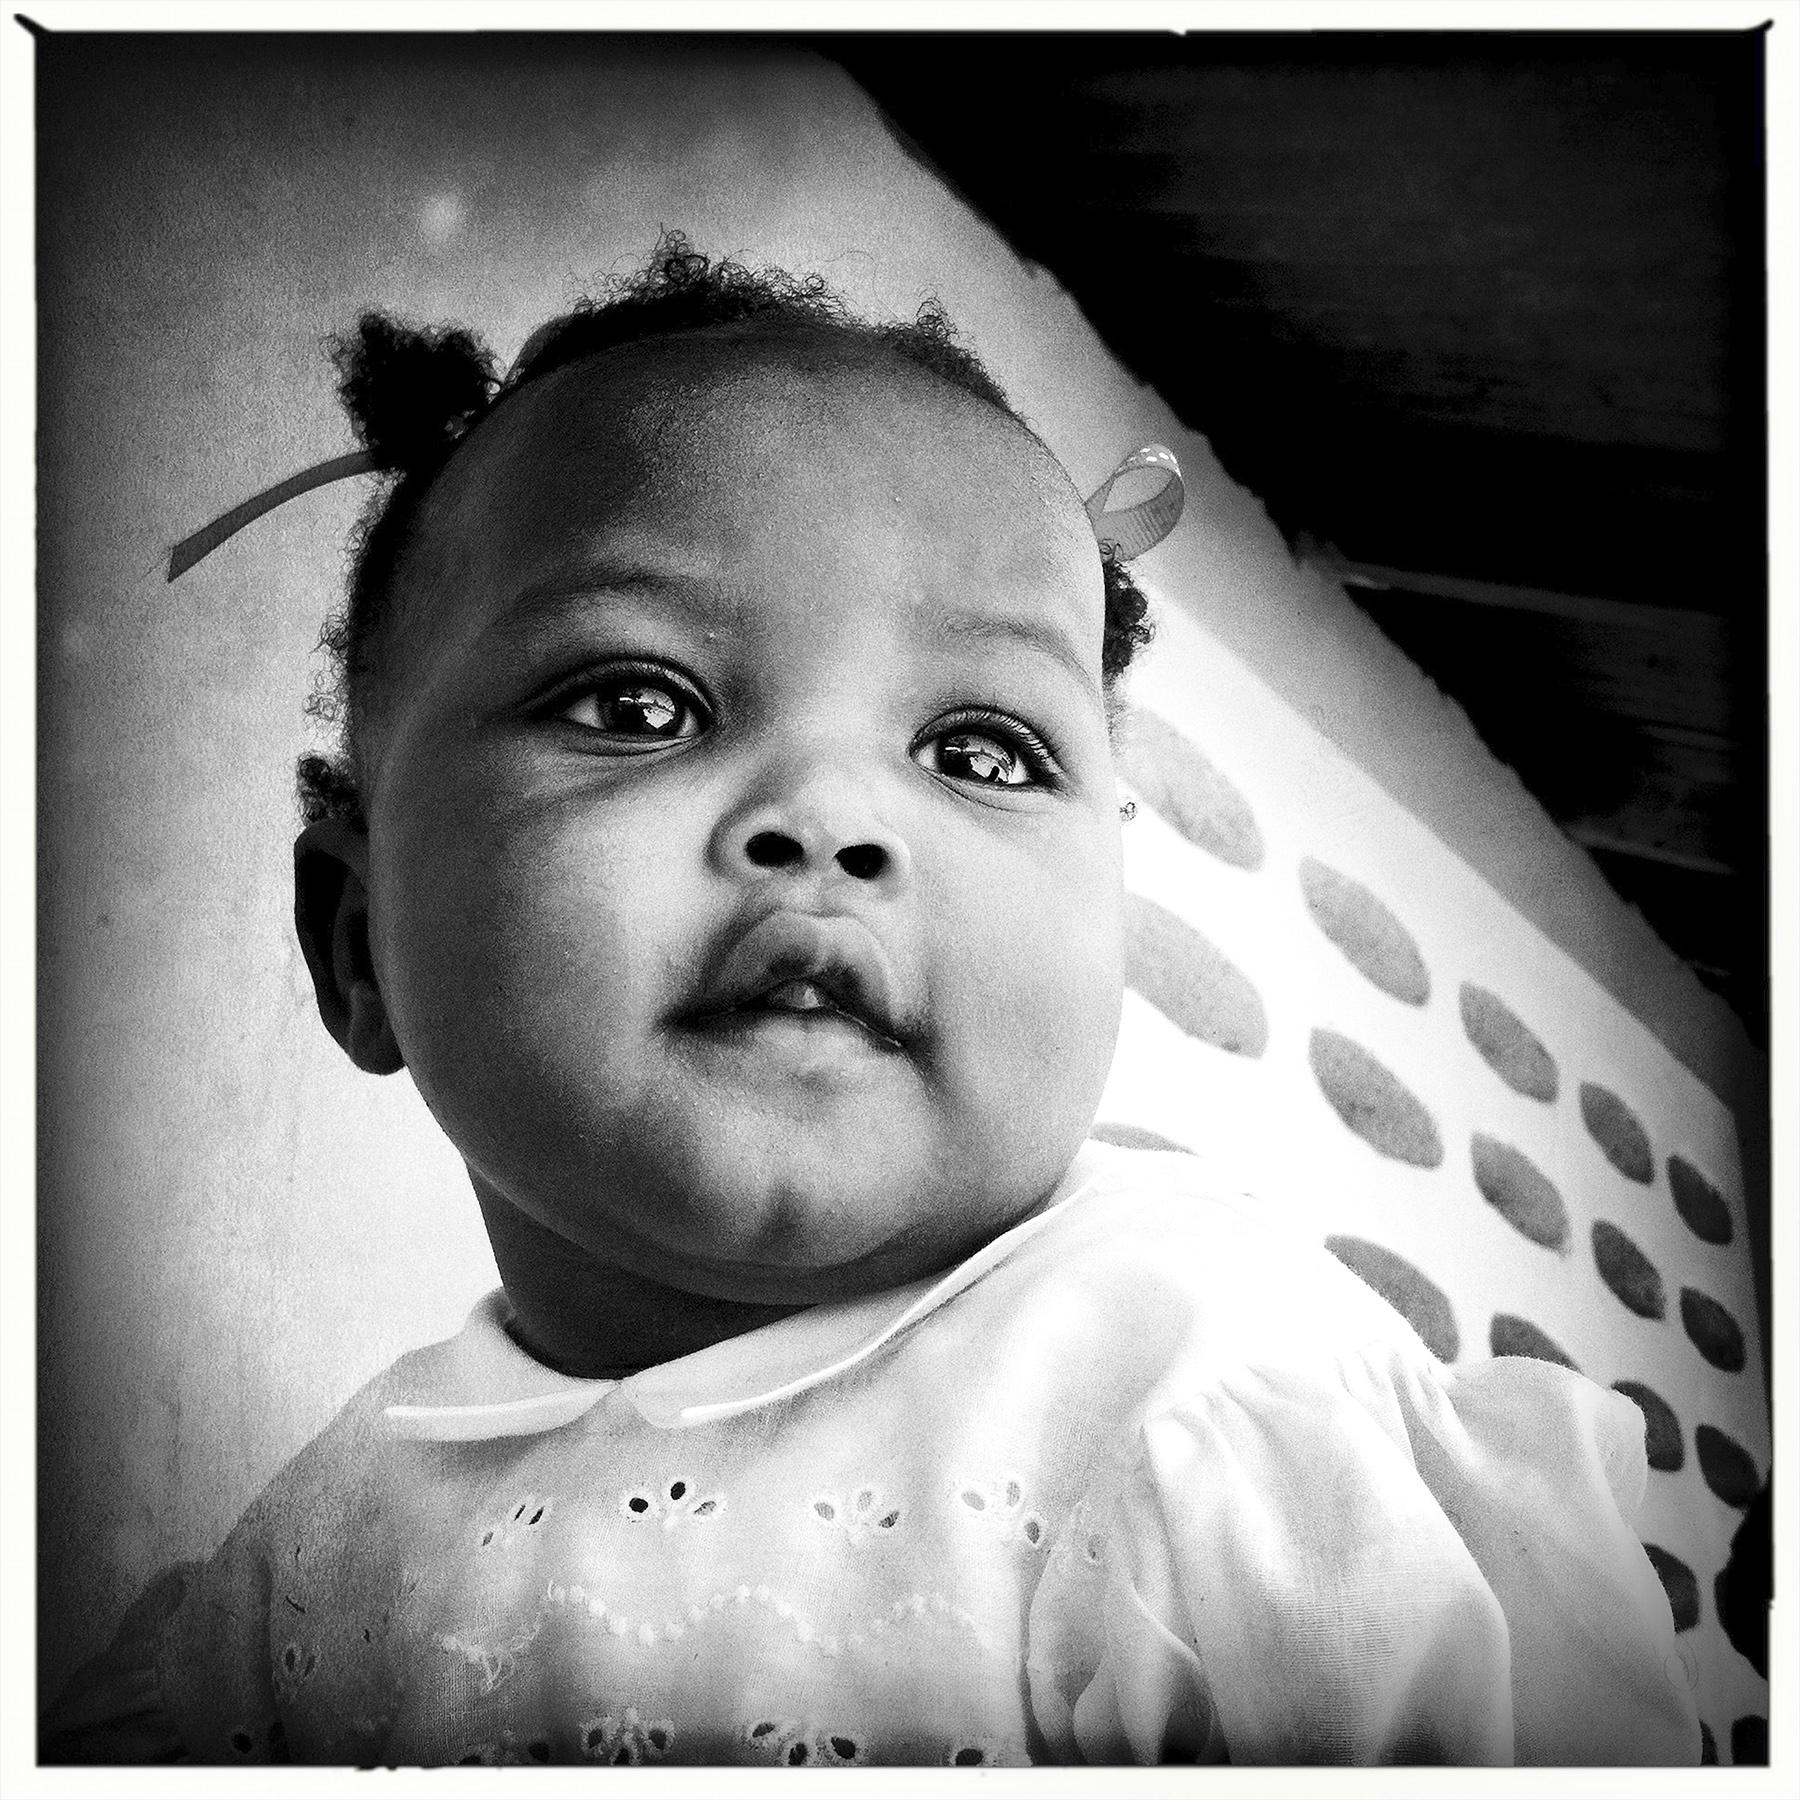 Cheryl_CleggFaces_of_the_Rasin_Foundation_Haiti_4.jpg